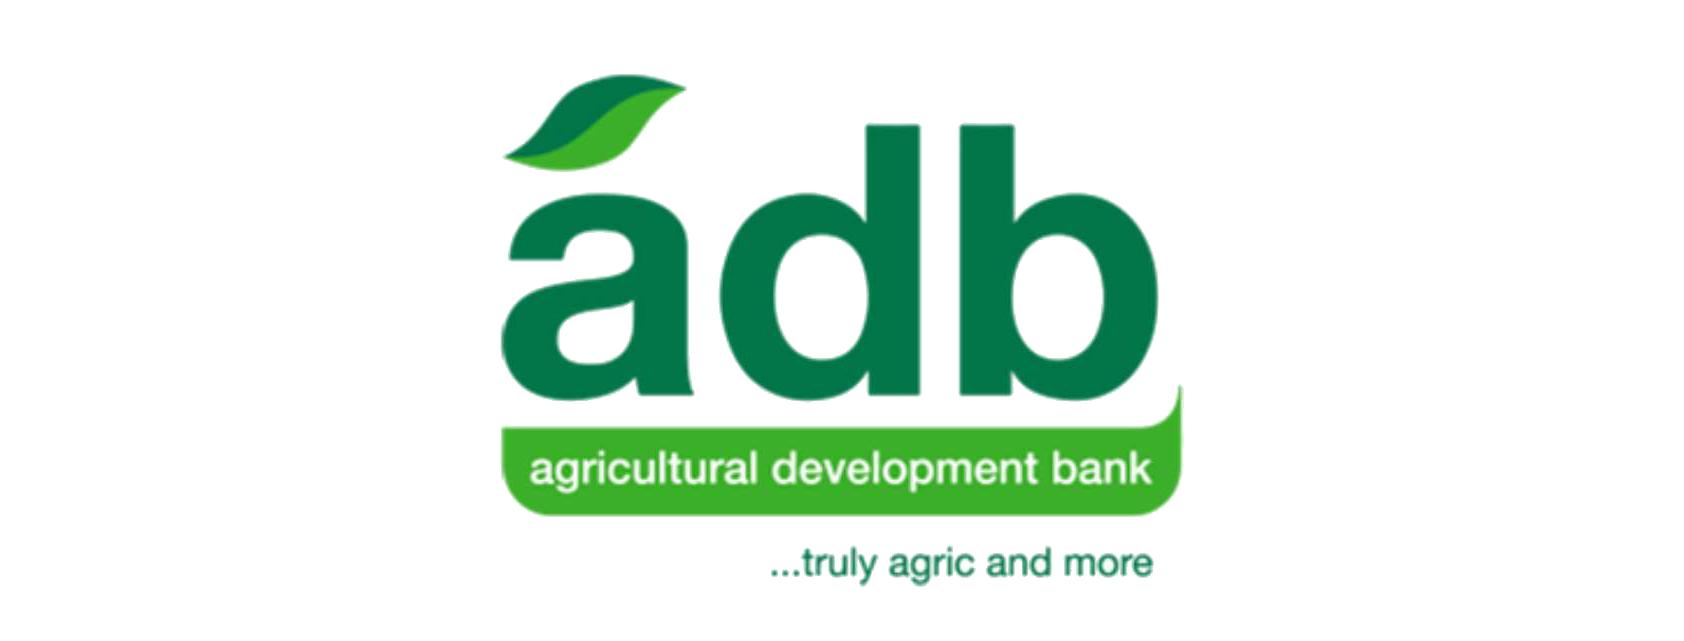 Agricultural Development Bank